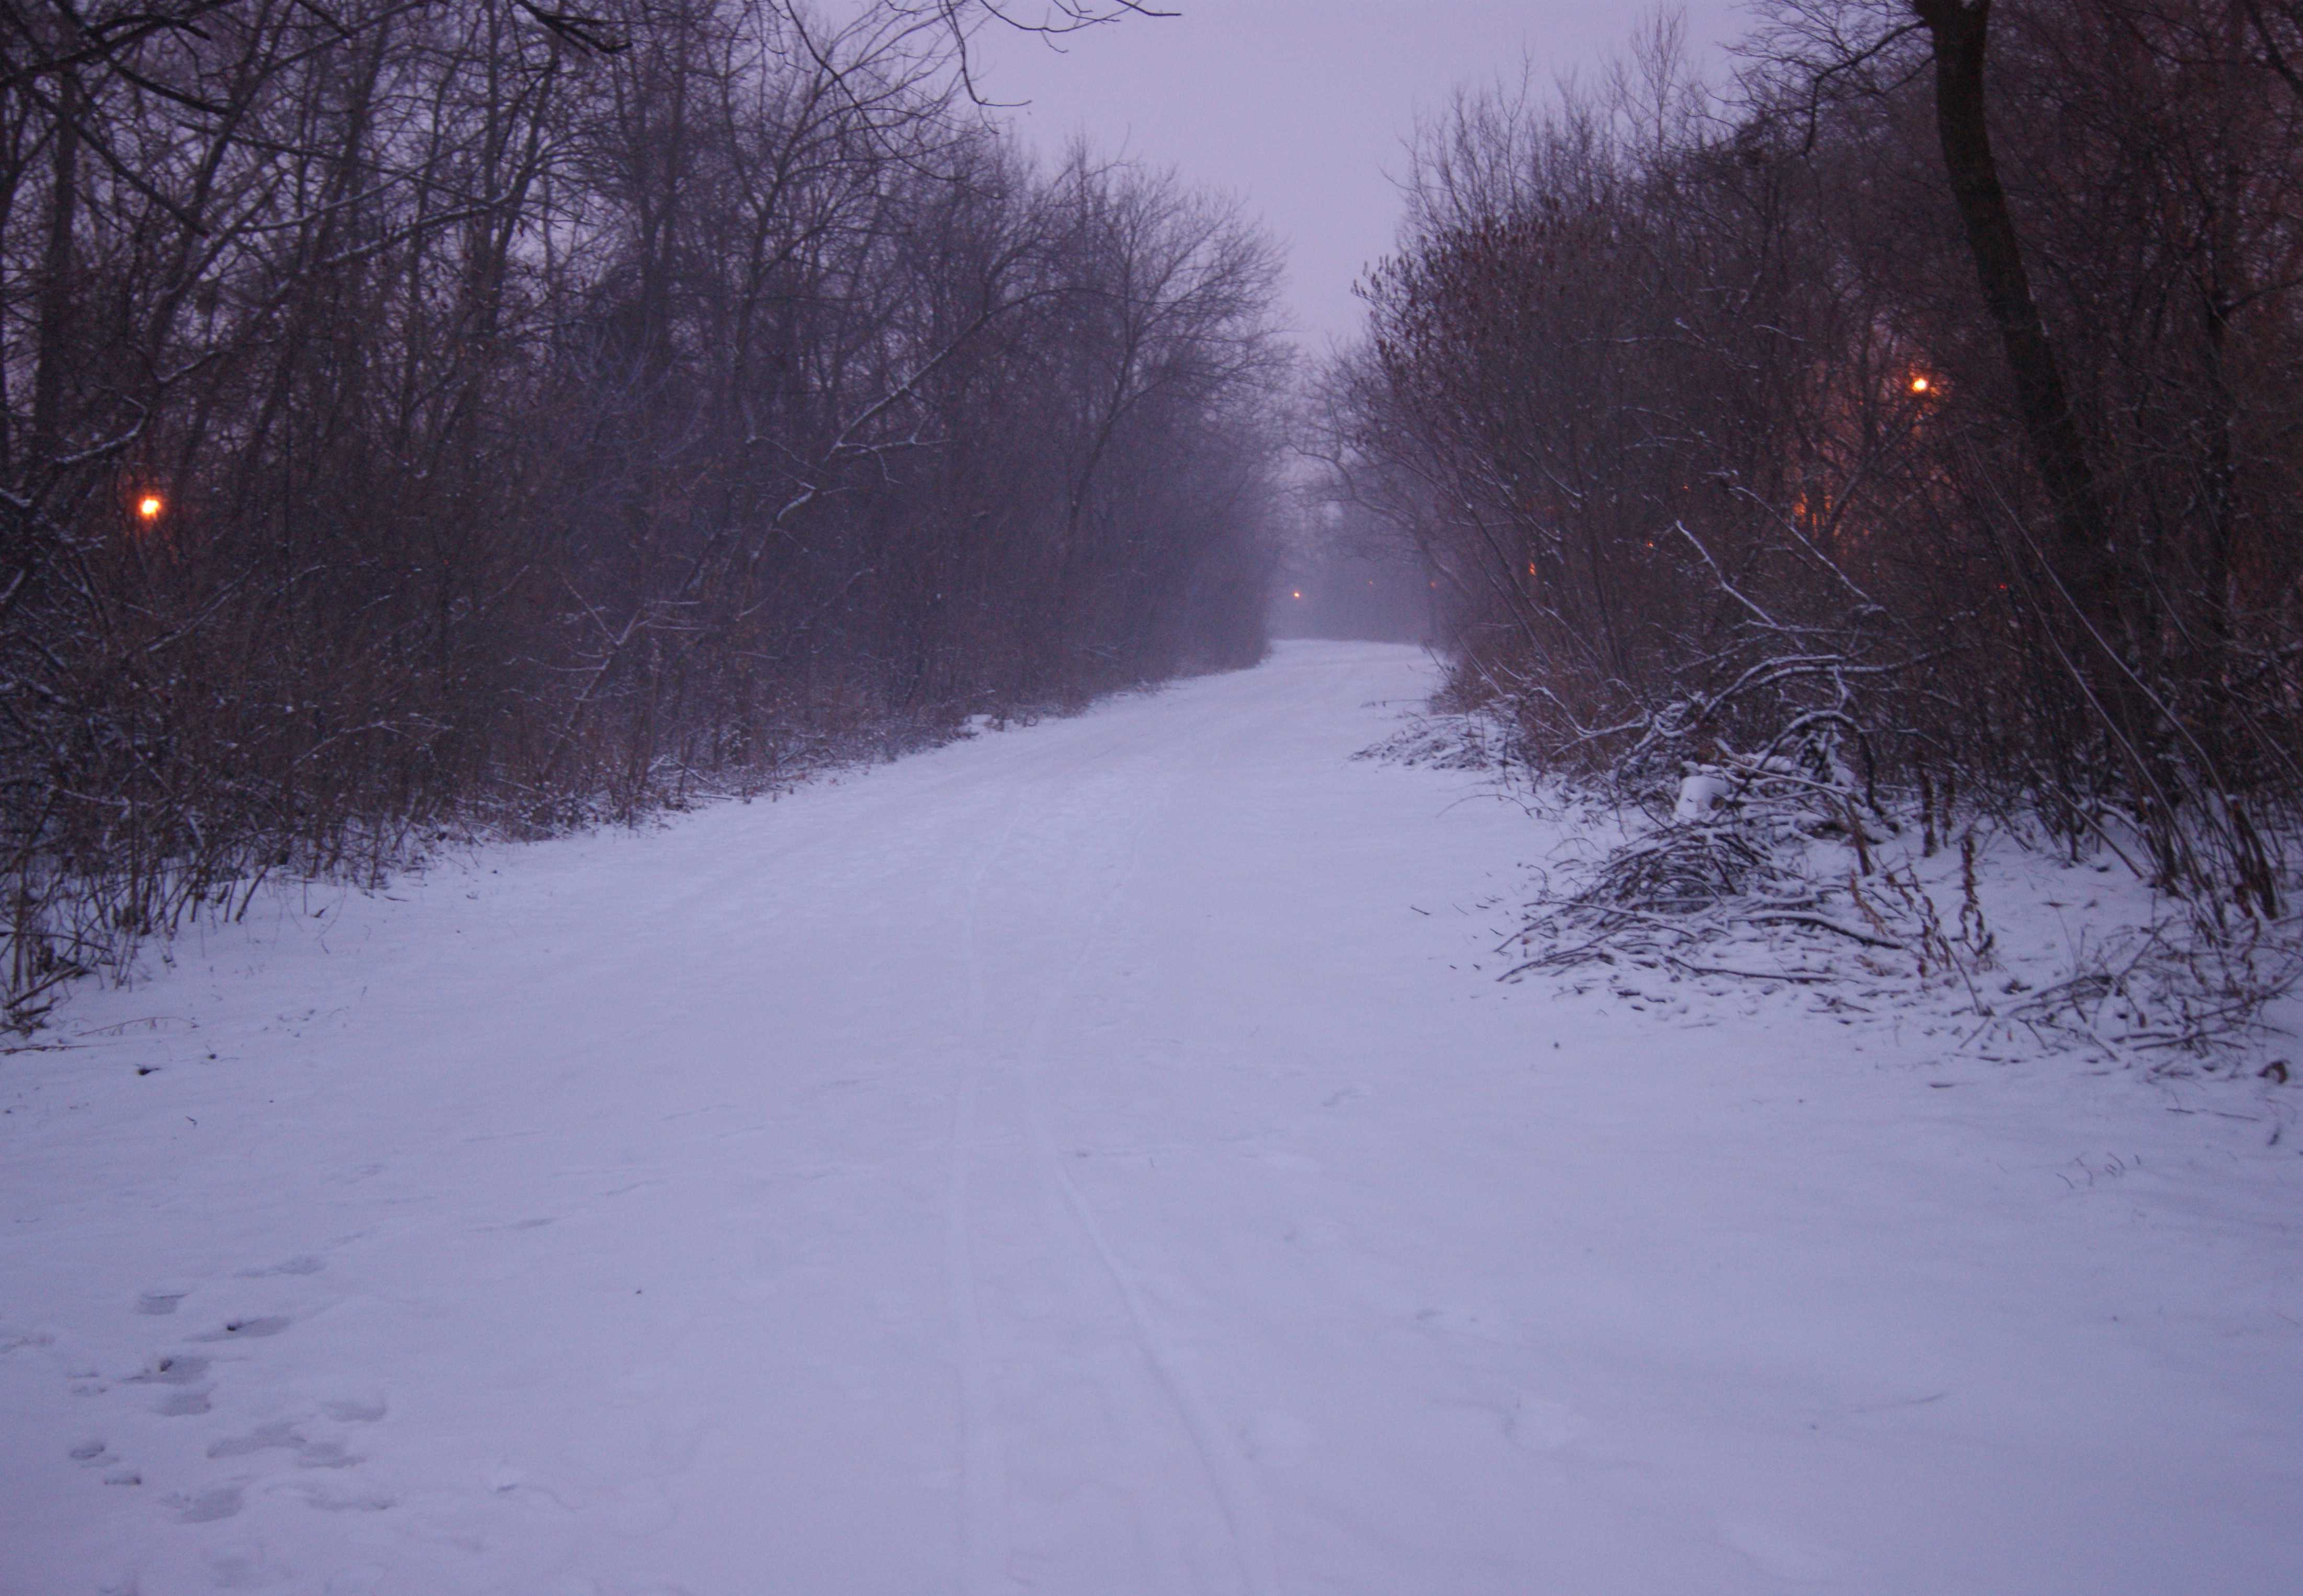 Snowy path in Shorewood, Wisconsin